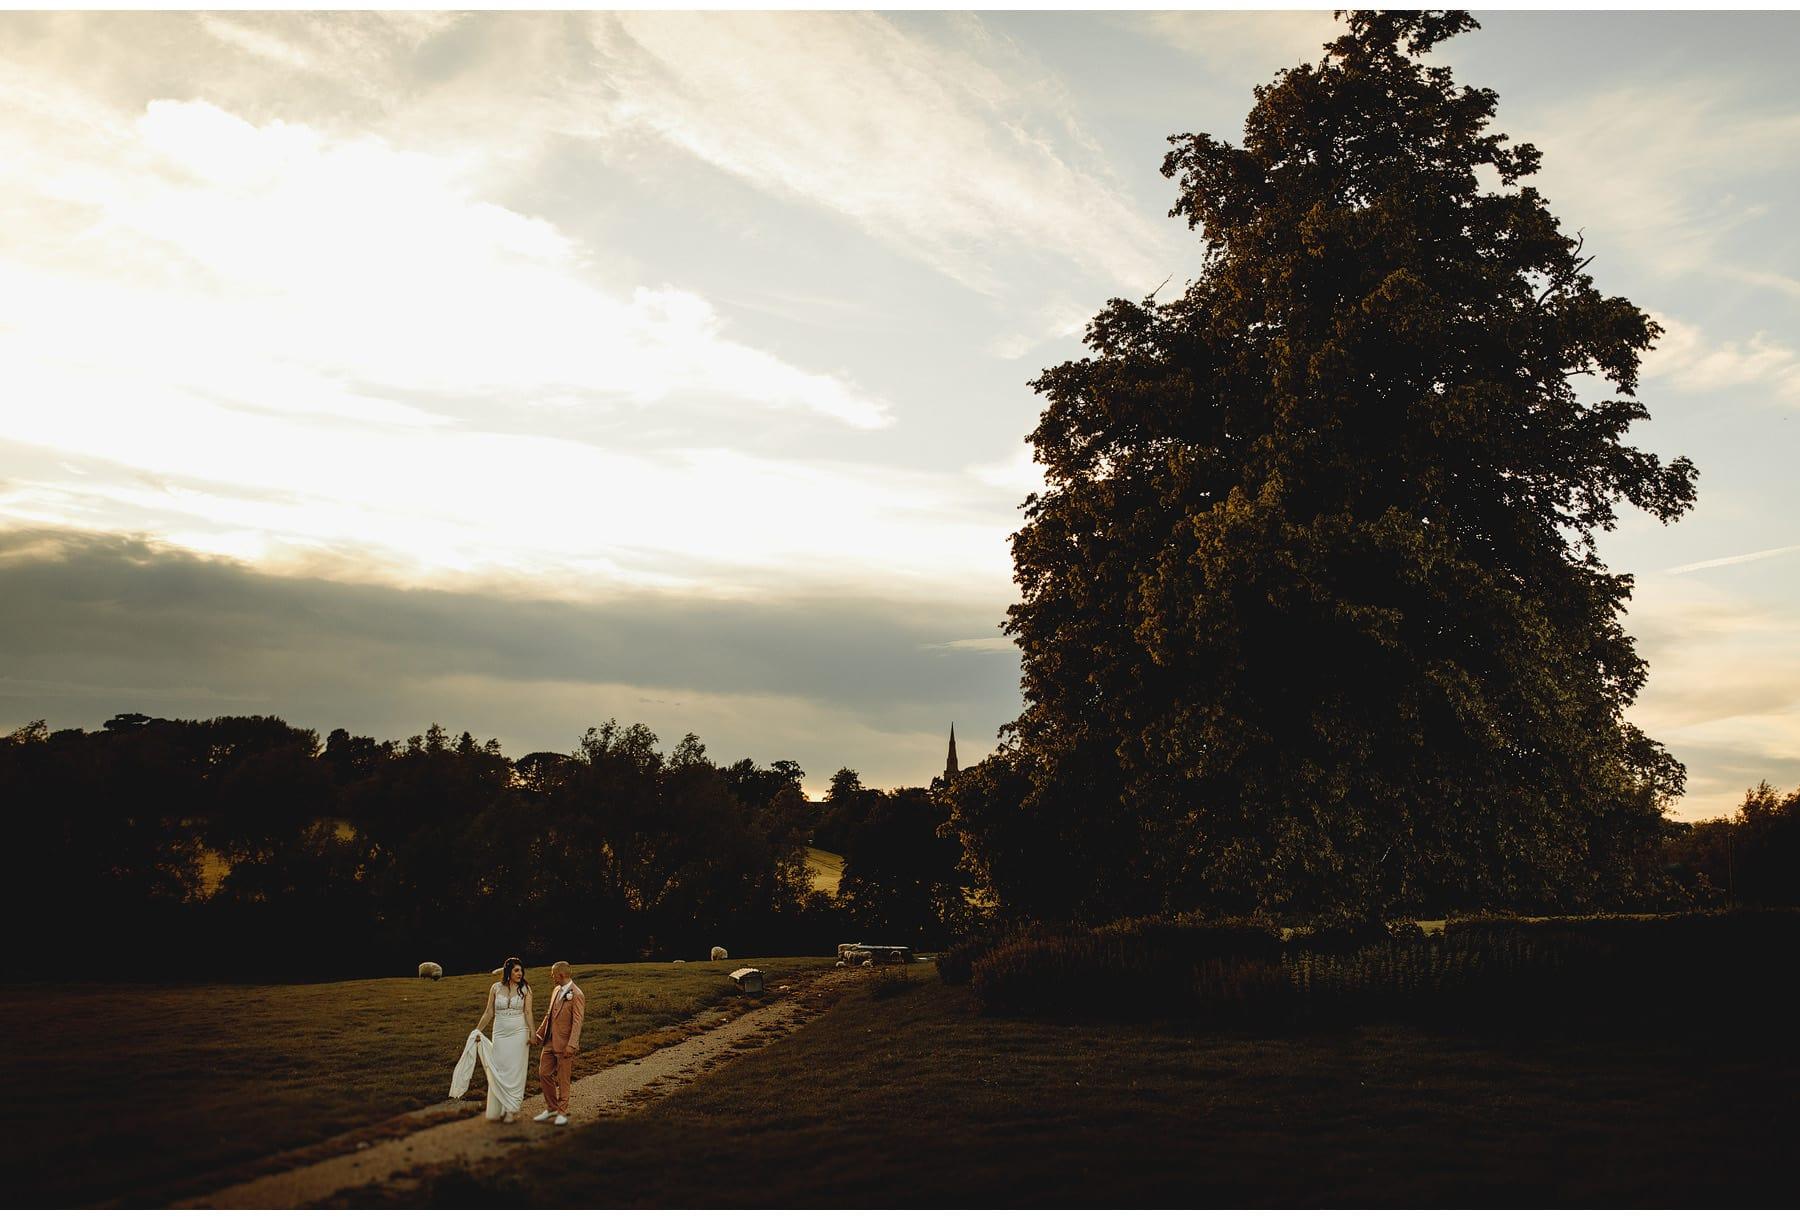 Horthorpe Hall wedding photos, the bride & groom in the evening sunshine